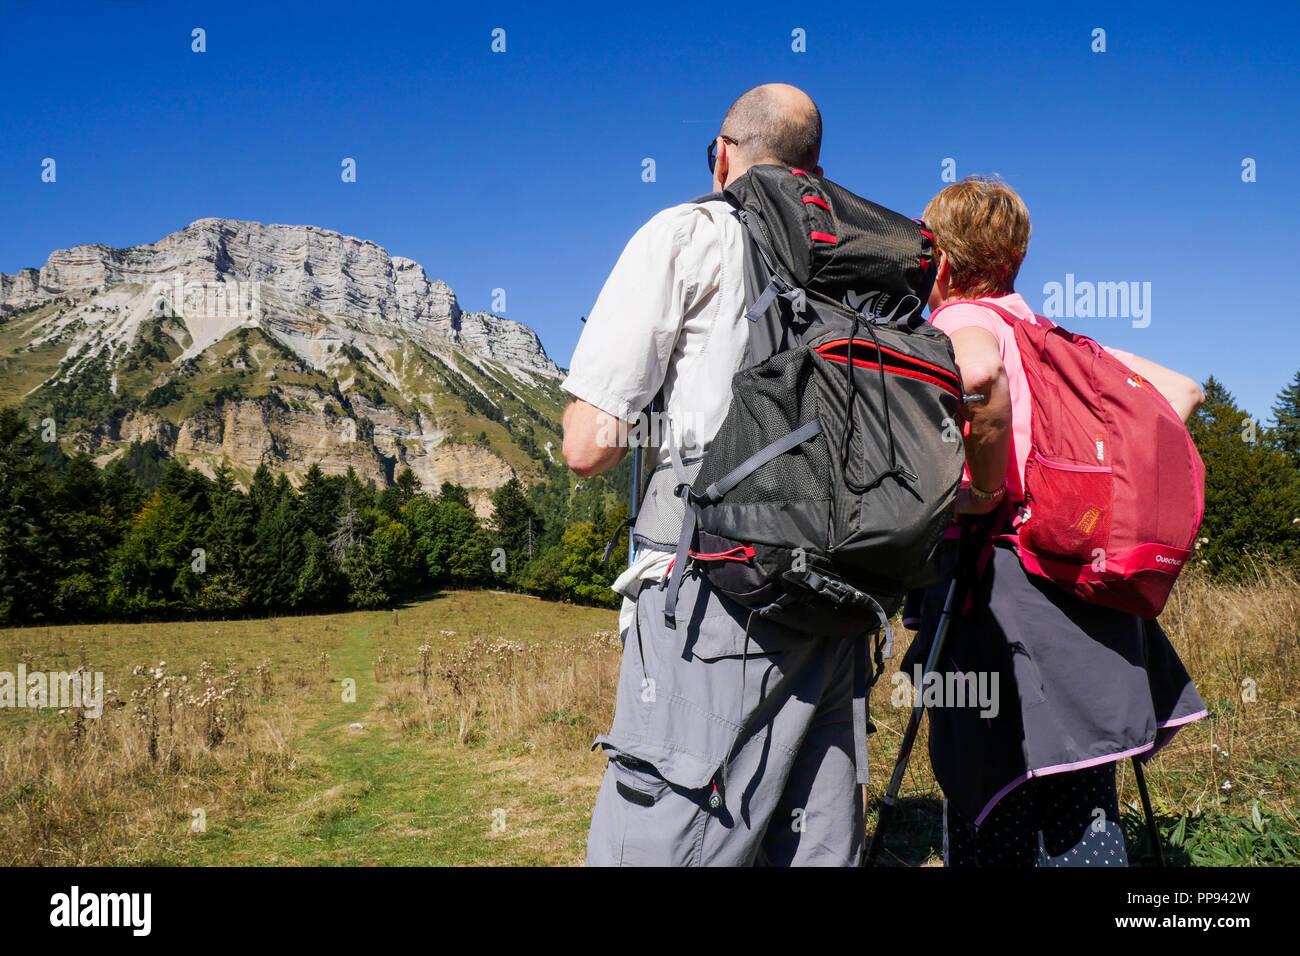 Mountain hiking, Chartreuse range, Isere, France - Stock Image